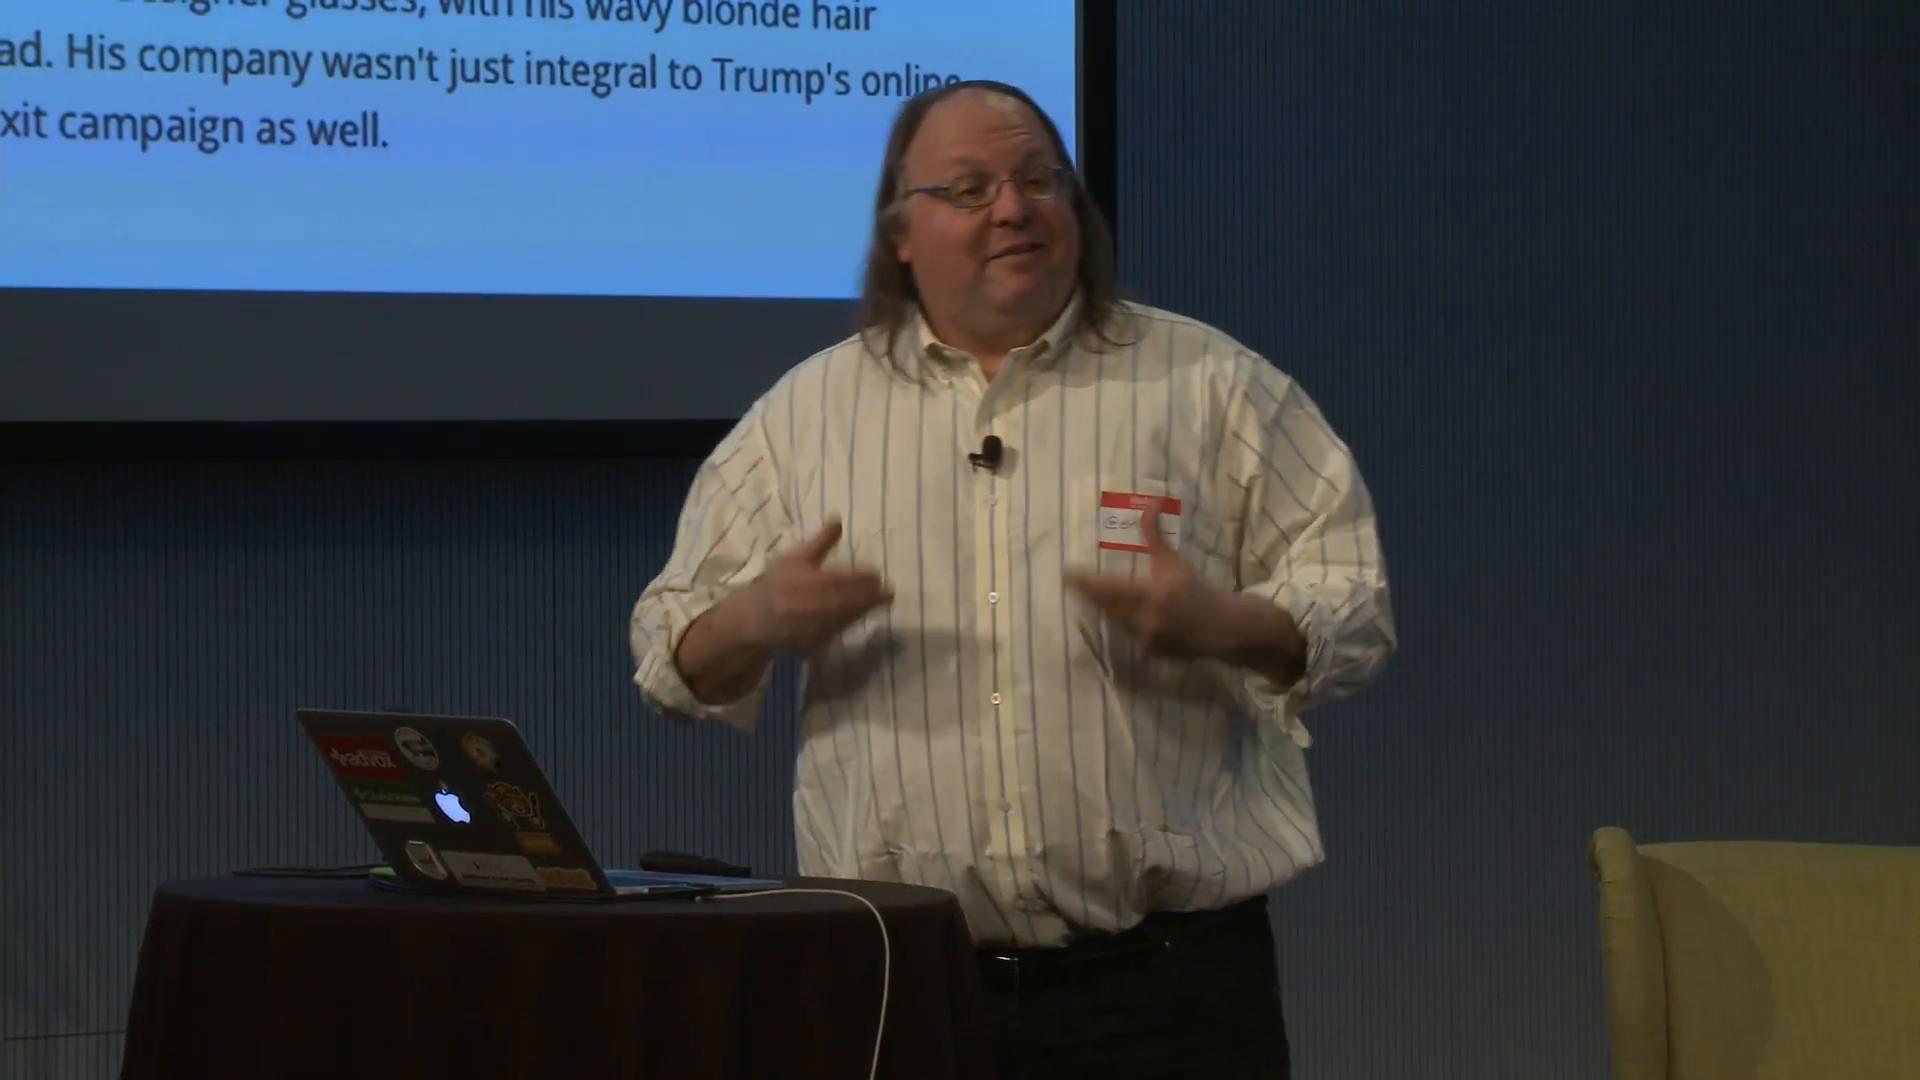 Using Data to Create Social Change - Ethan Zuckerman